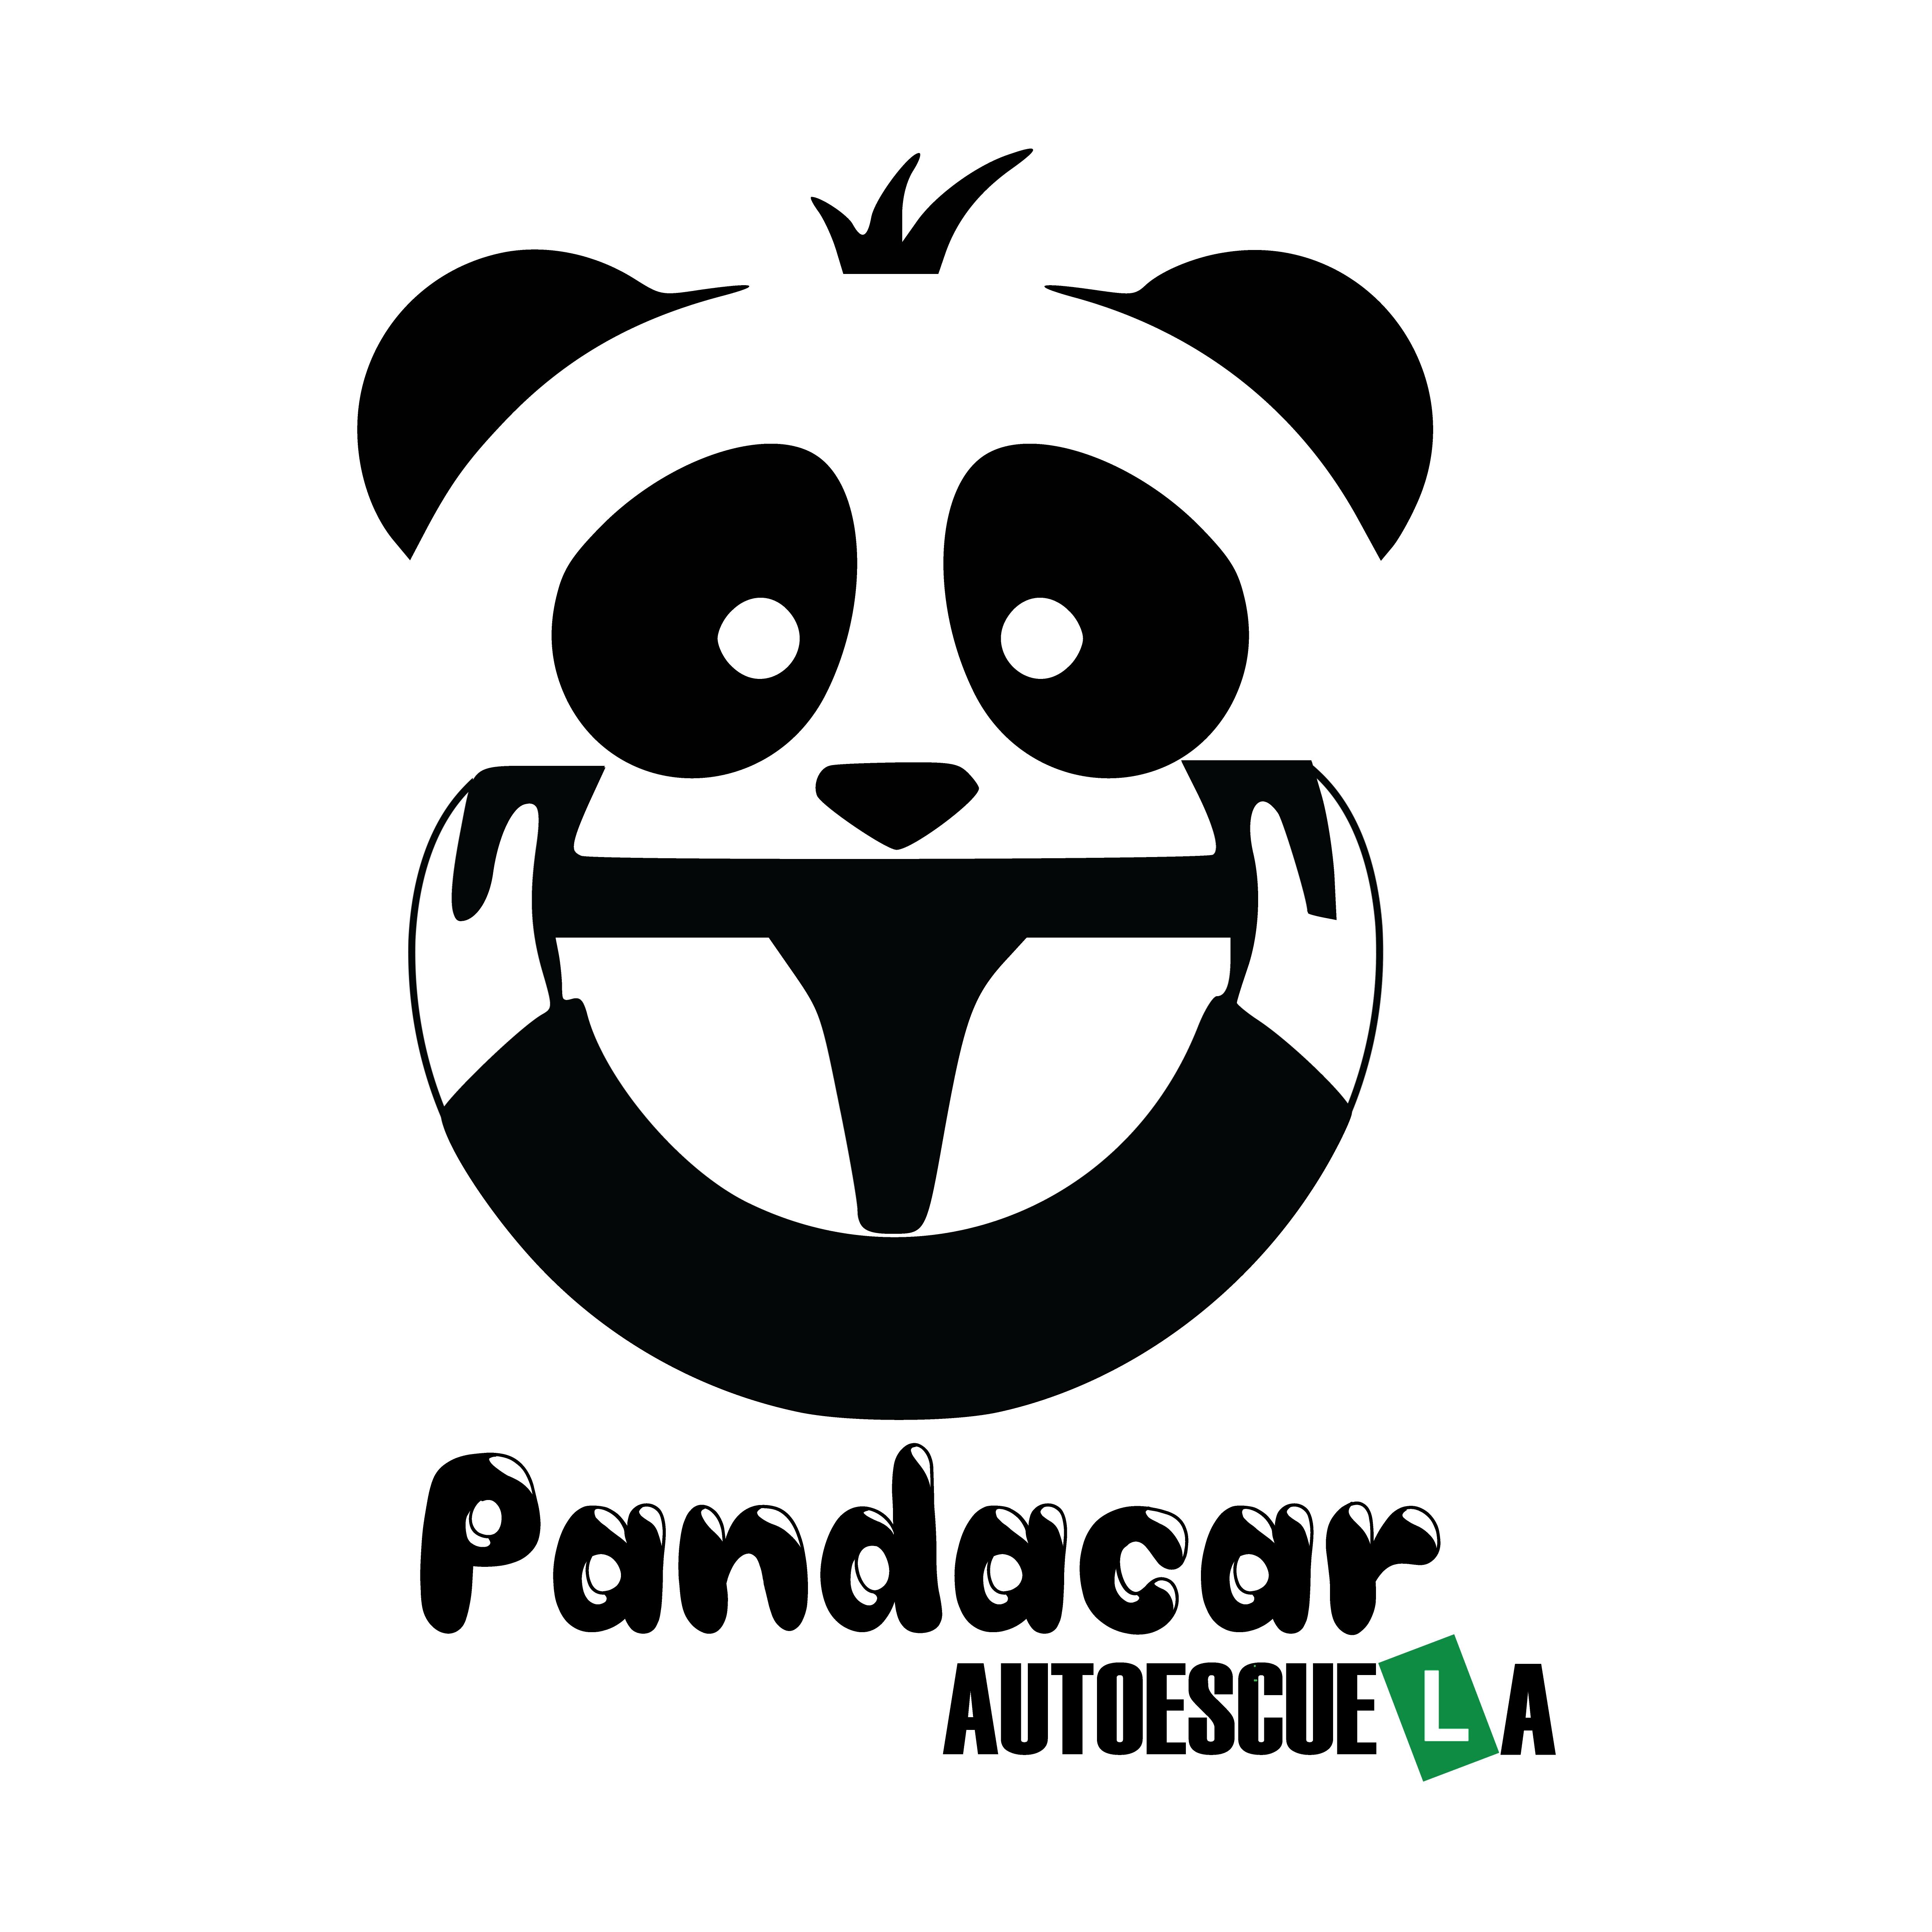 Logotipo Pandacar Autoescuela